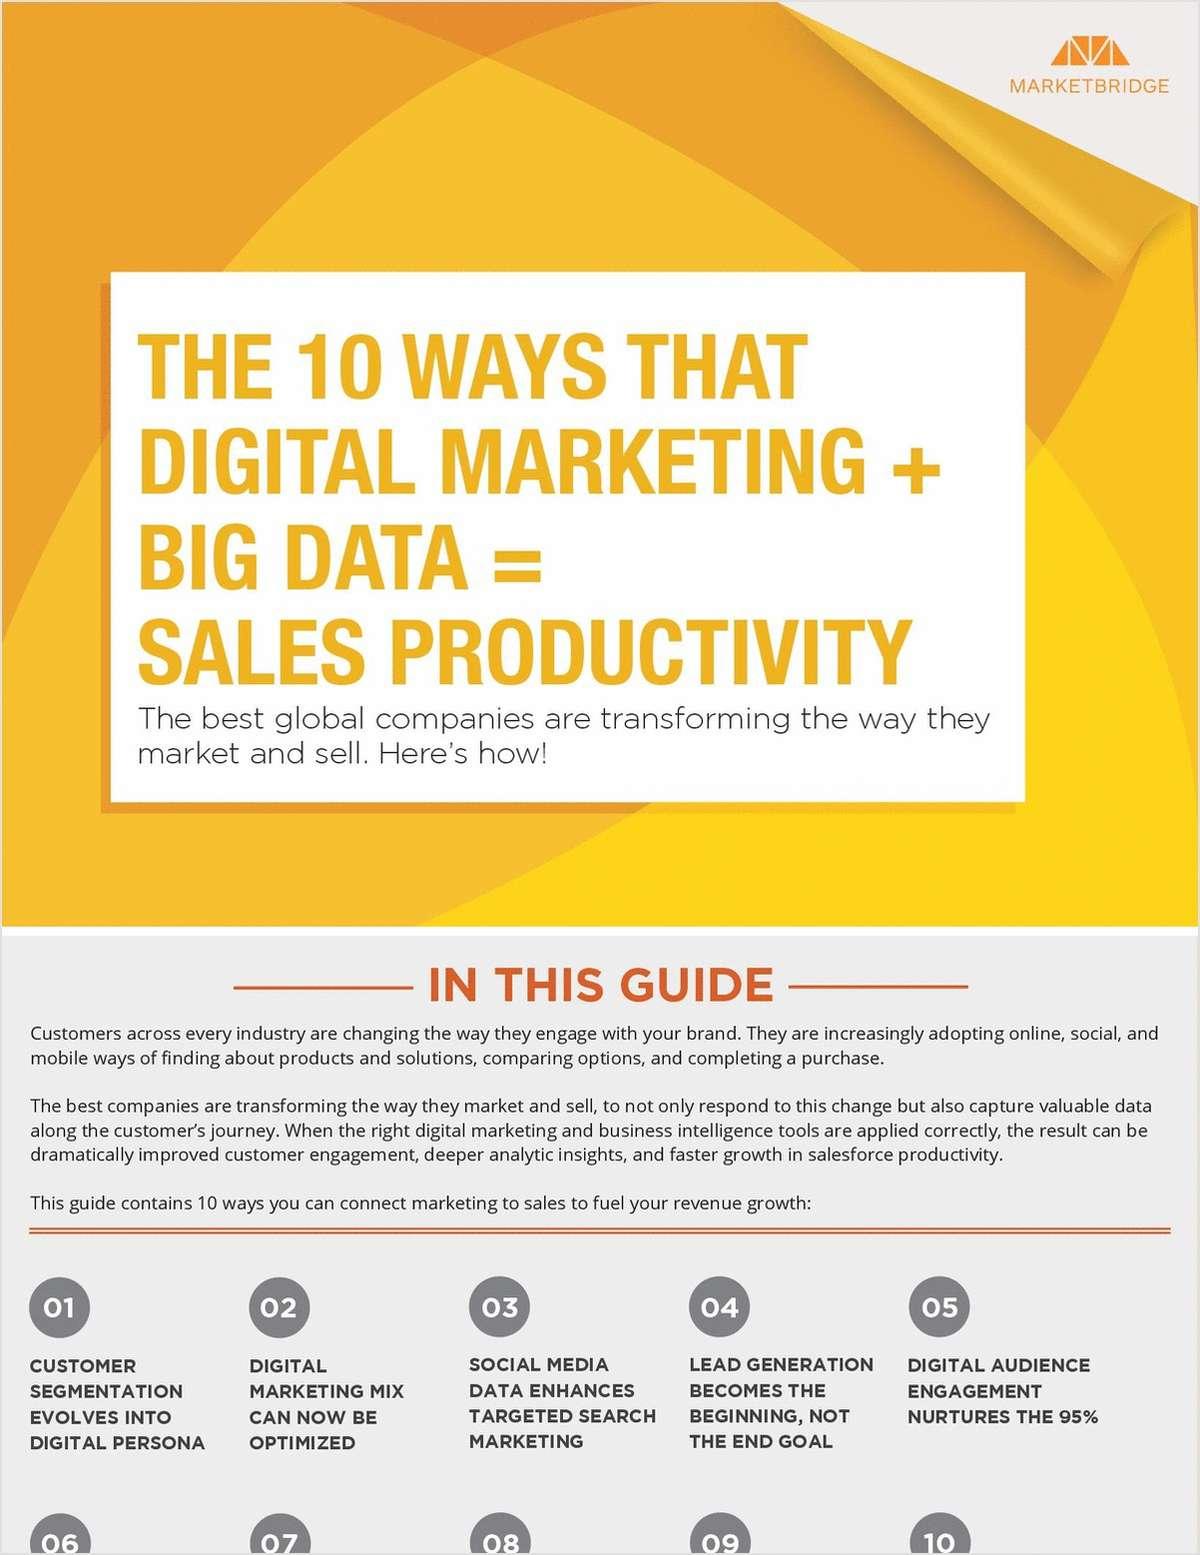 The 10 Ways That Digital Marketing + Big Data = Sales Productivity